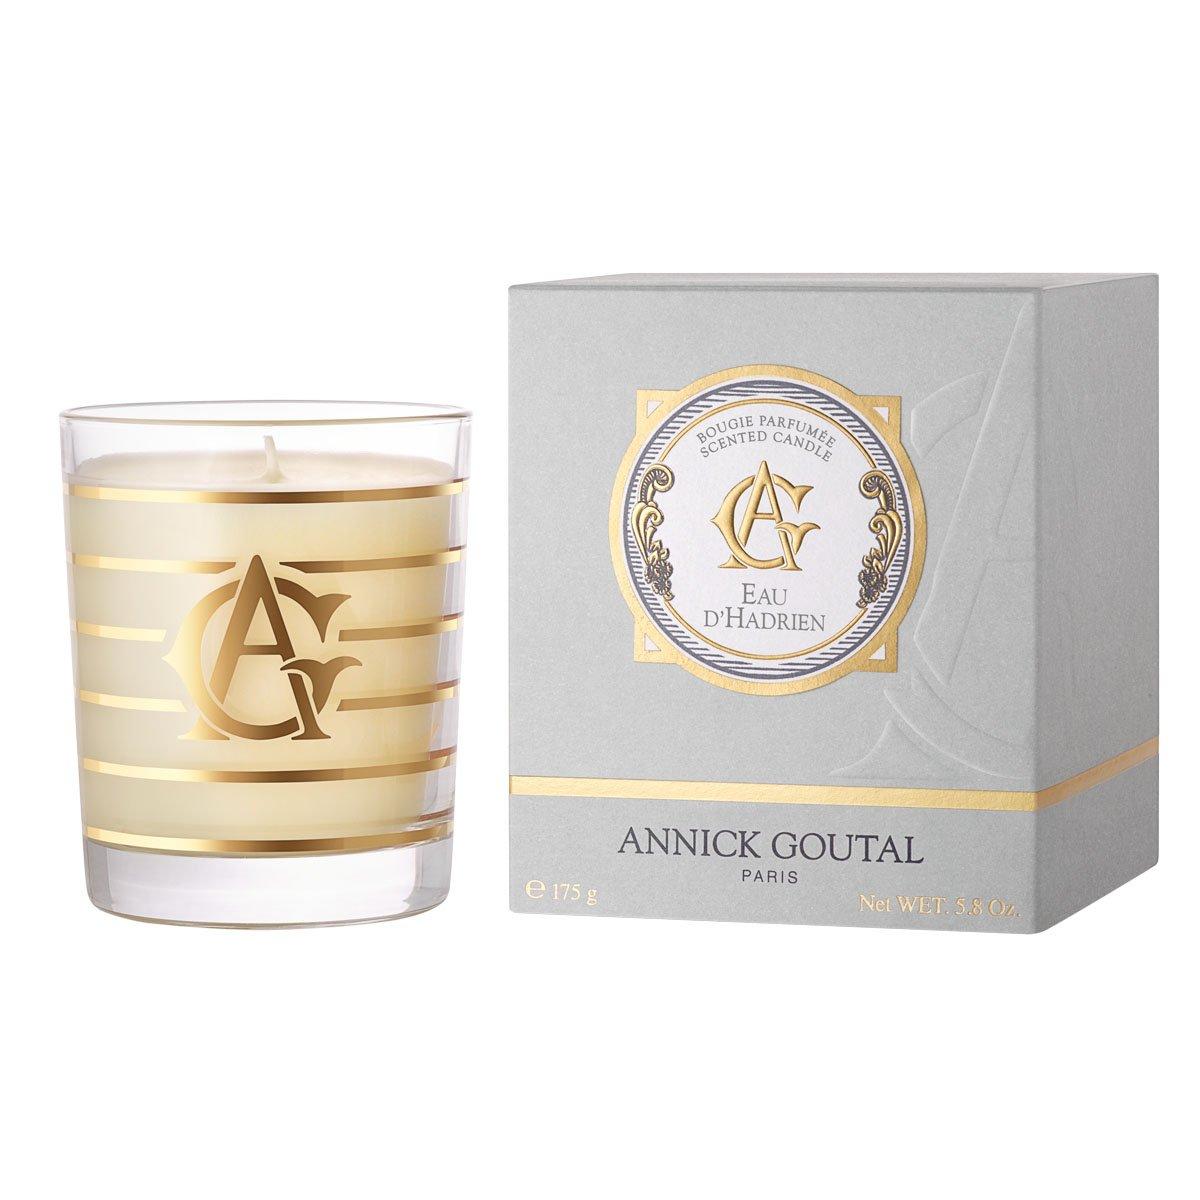 Annick Goutal Eau D'hadrien Perfumed Candle, 5.8 Ounce